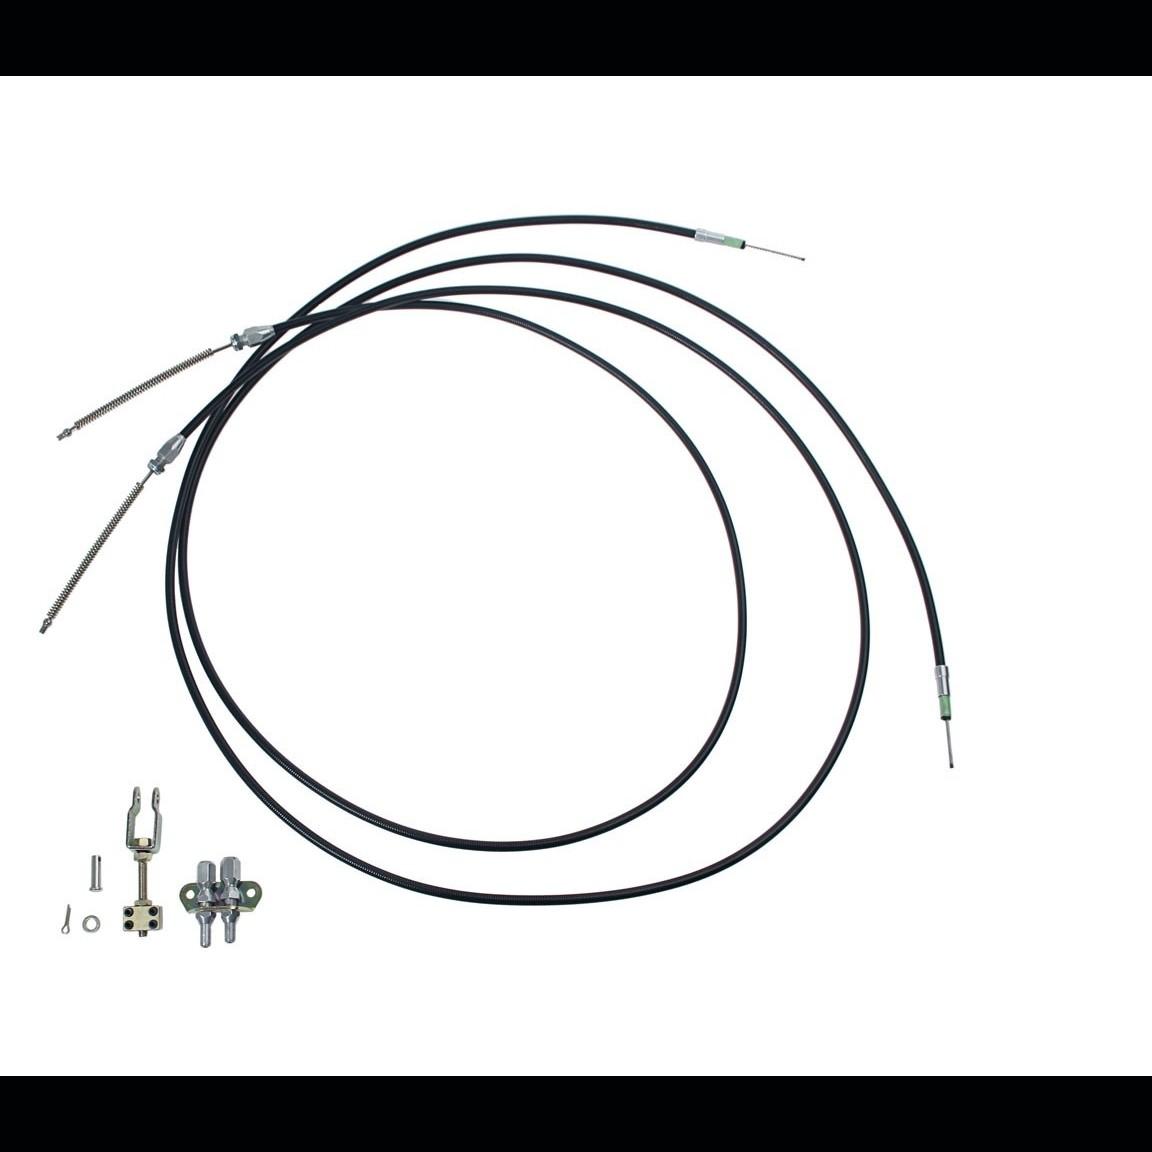 c6 corvette transmission wiring harness